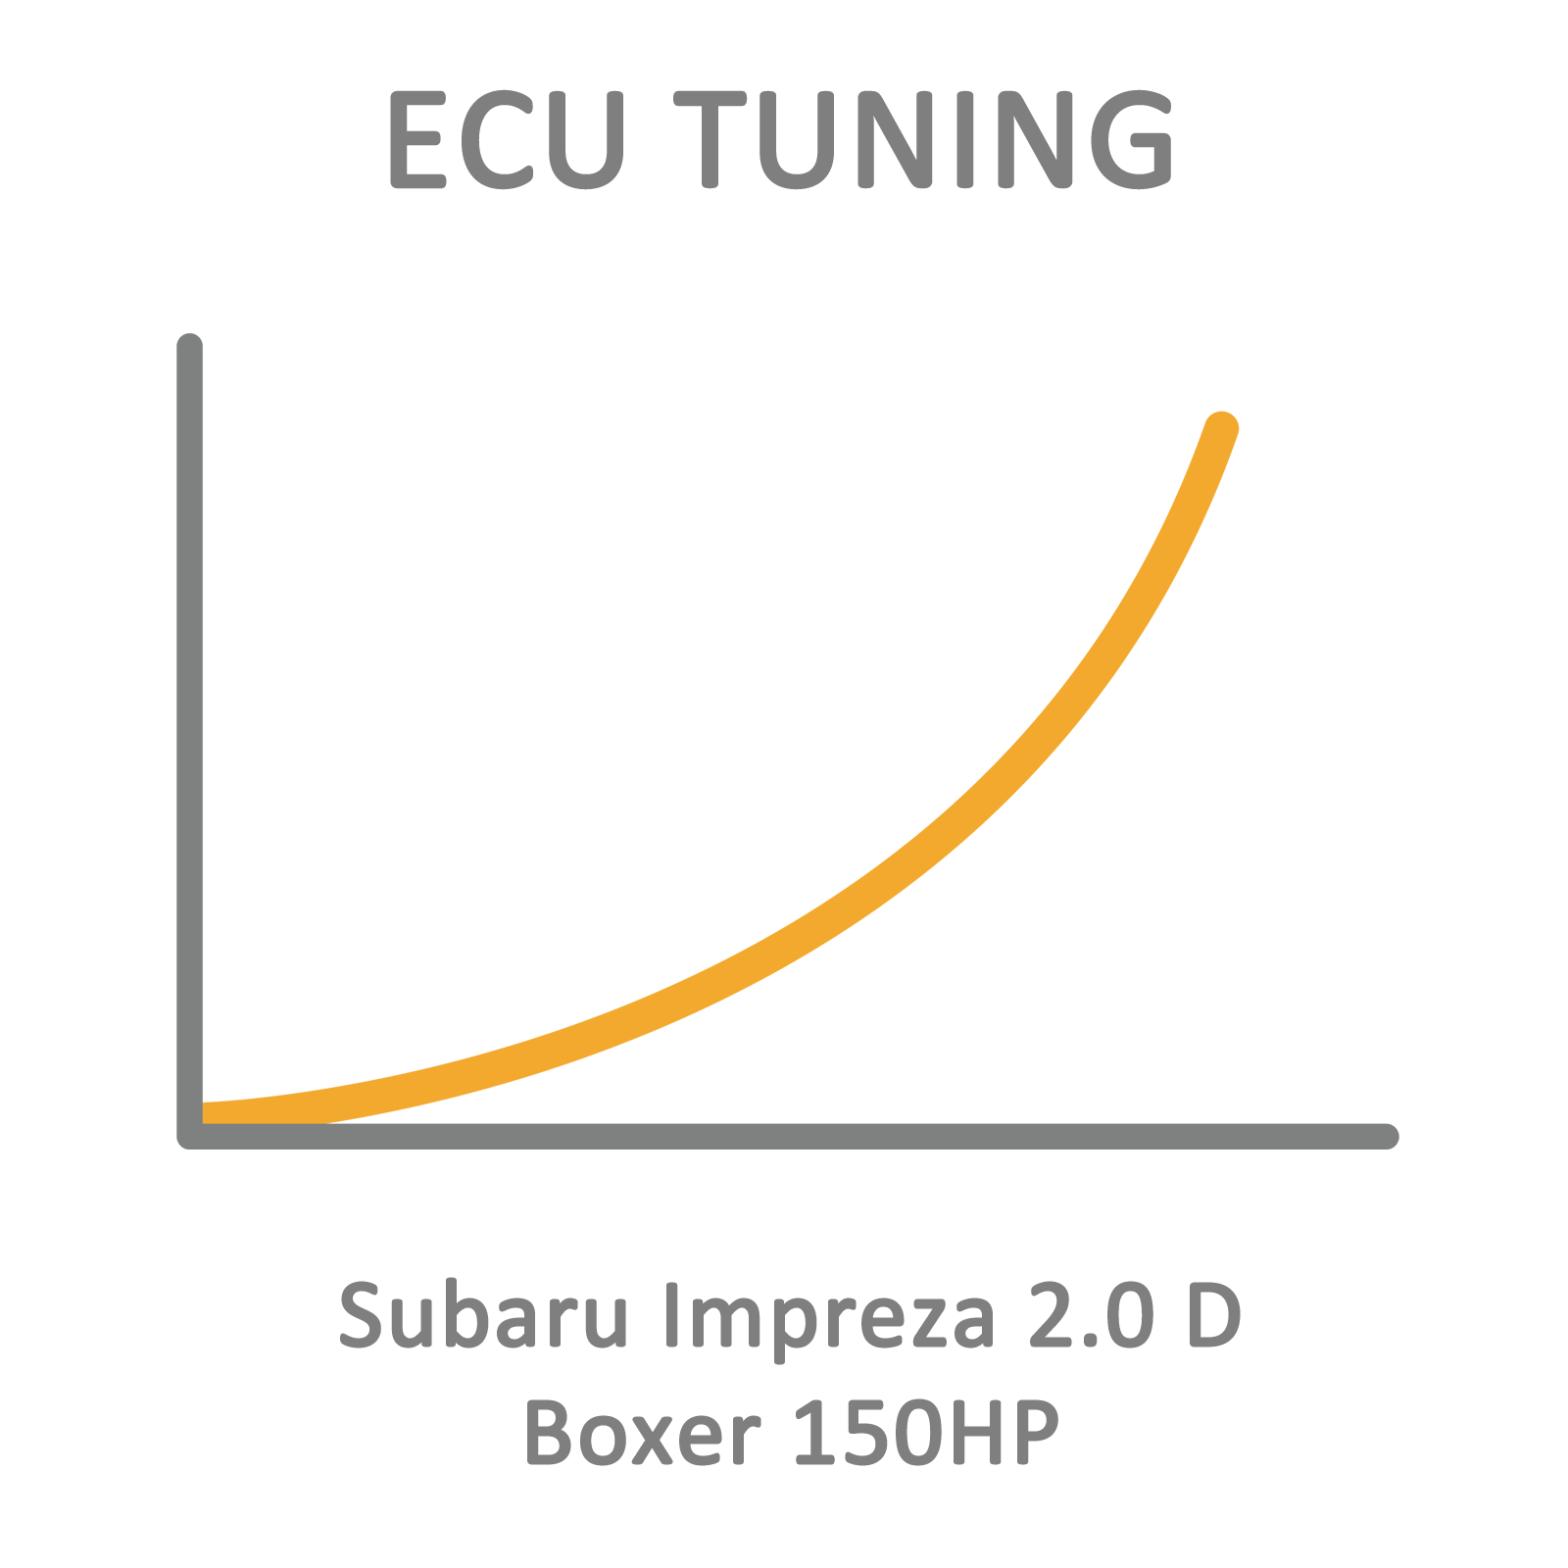 Subaru Impreza 2.0 D Boxer 150HP ECU Tuning Remapping